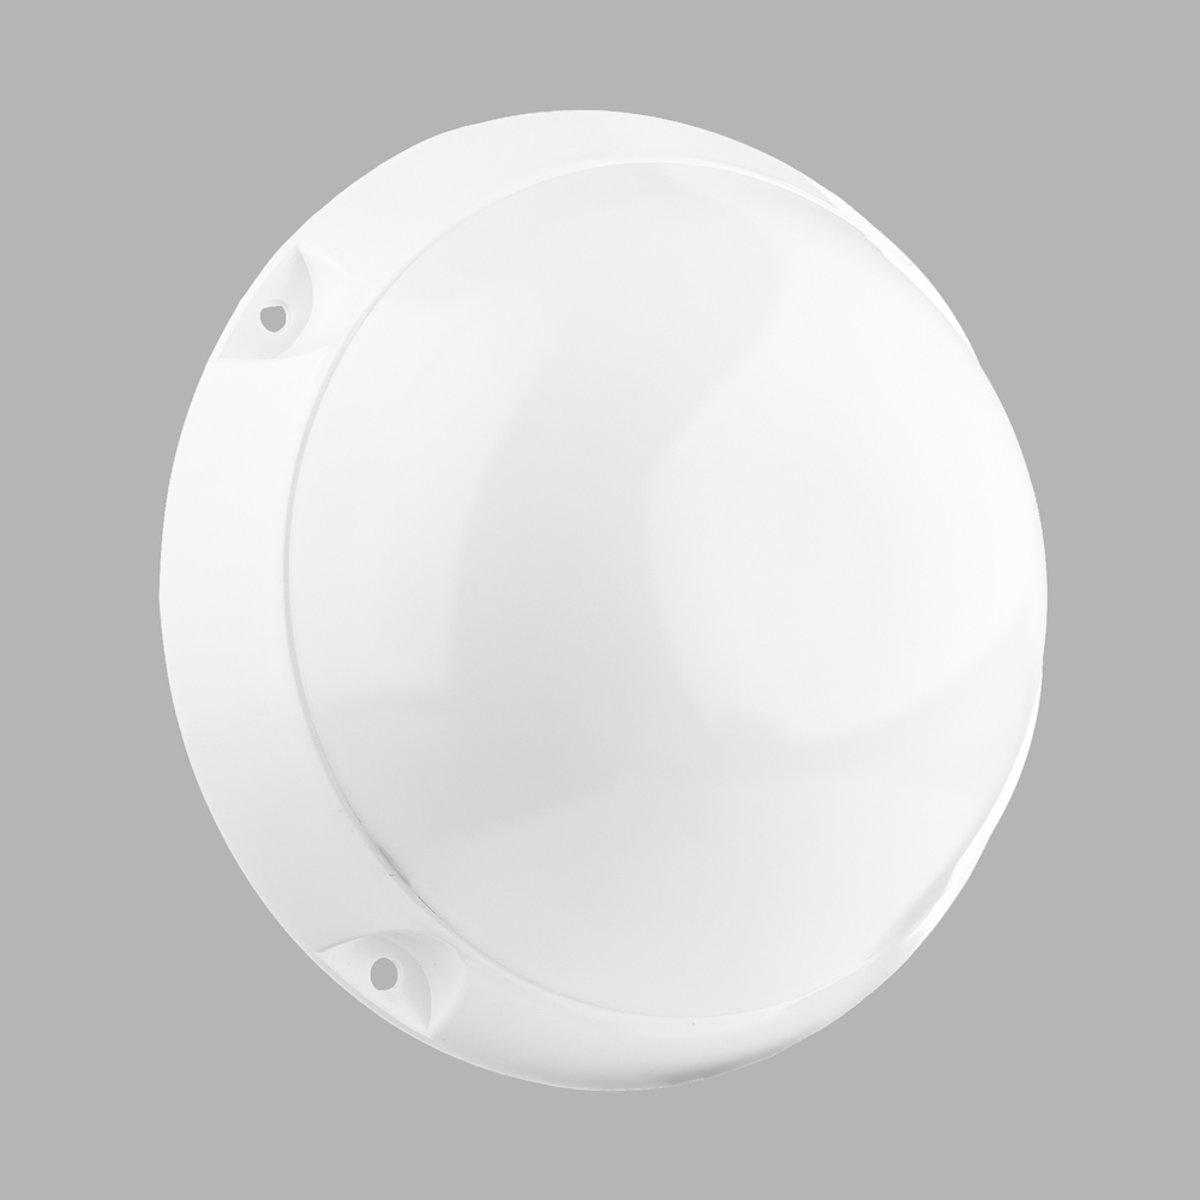 Profitec LED светильник 12W 1200Lm 4500K IP20